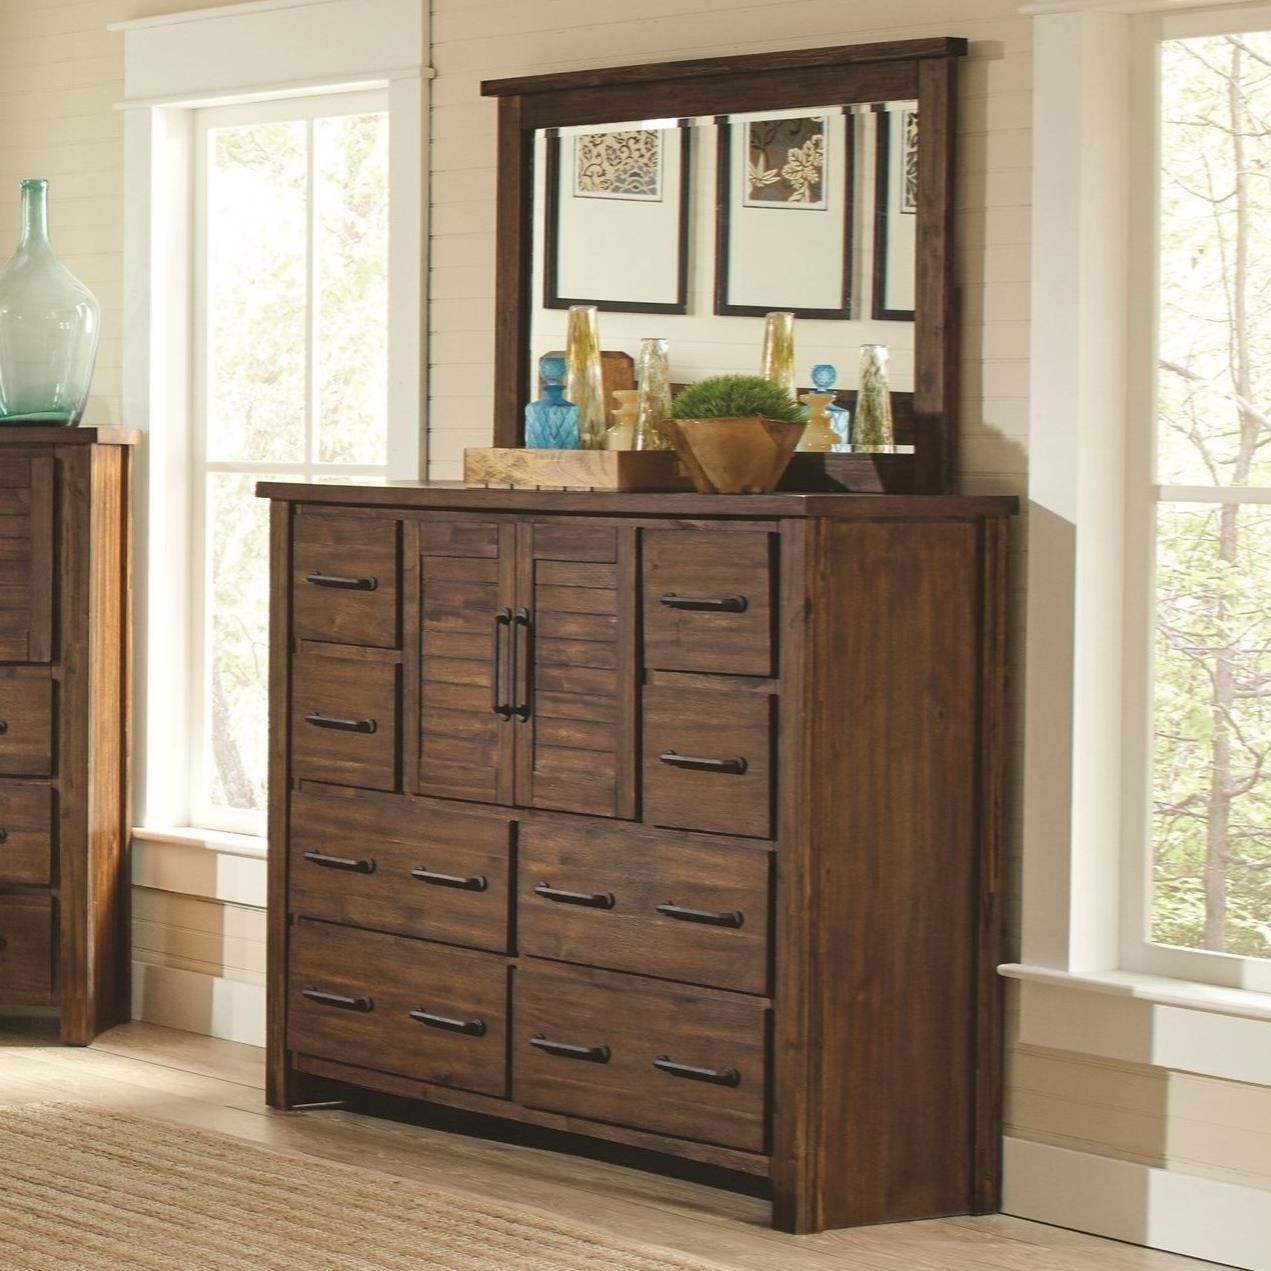 Tall Dresser with 2 Doors & Mirror